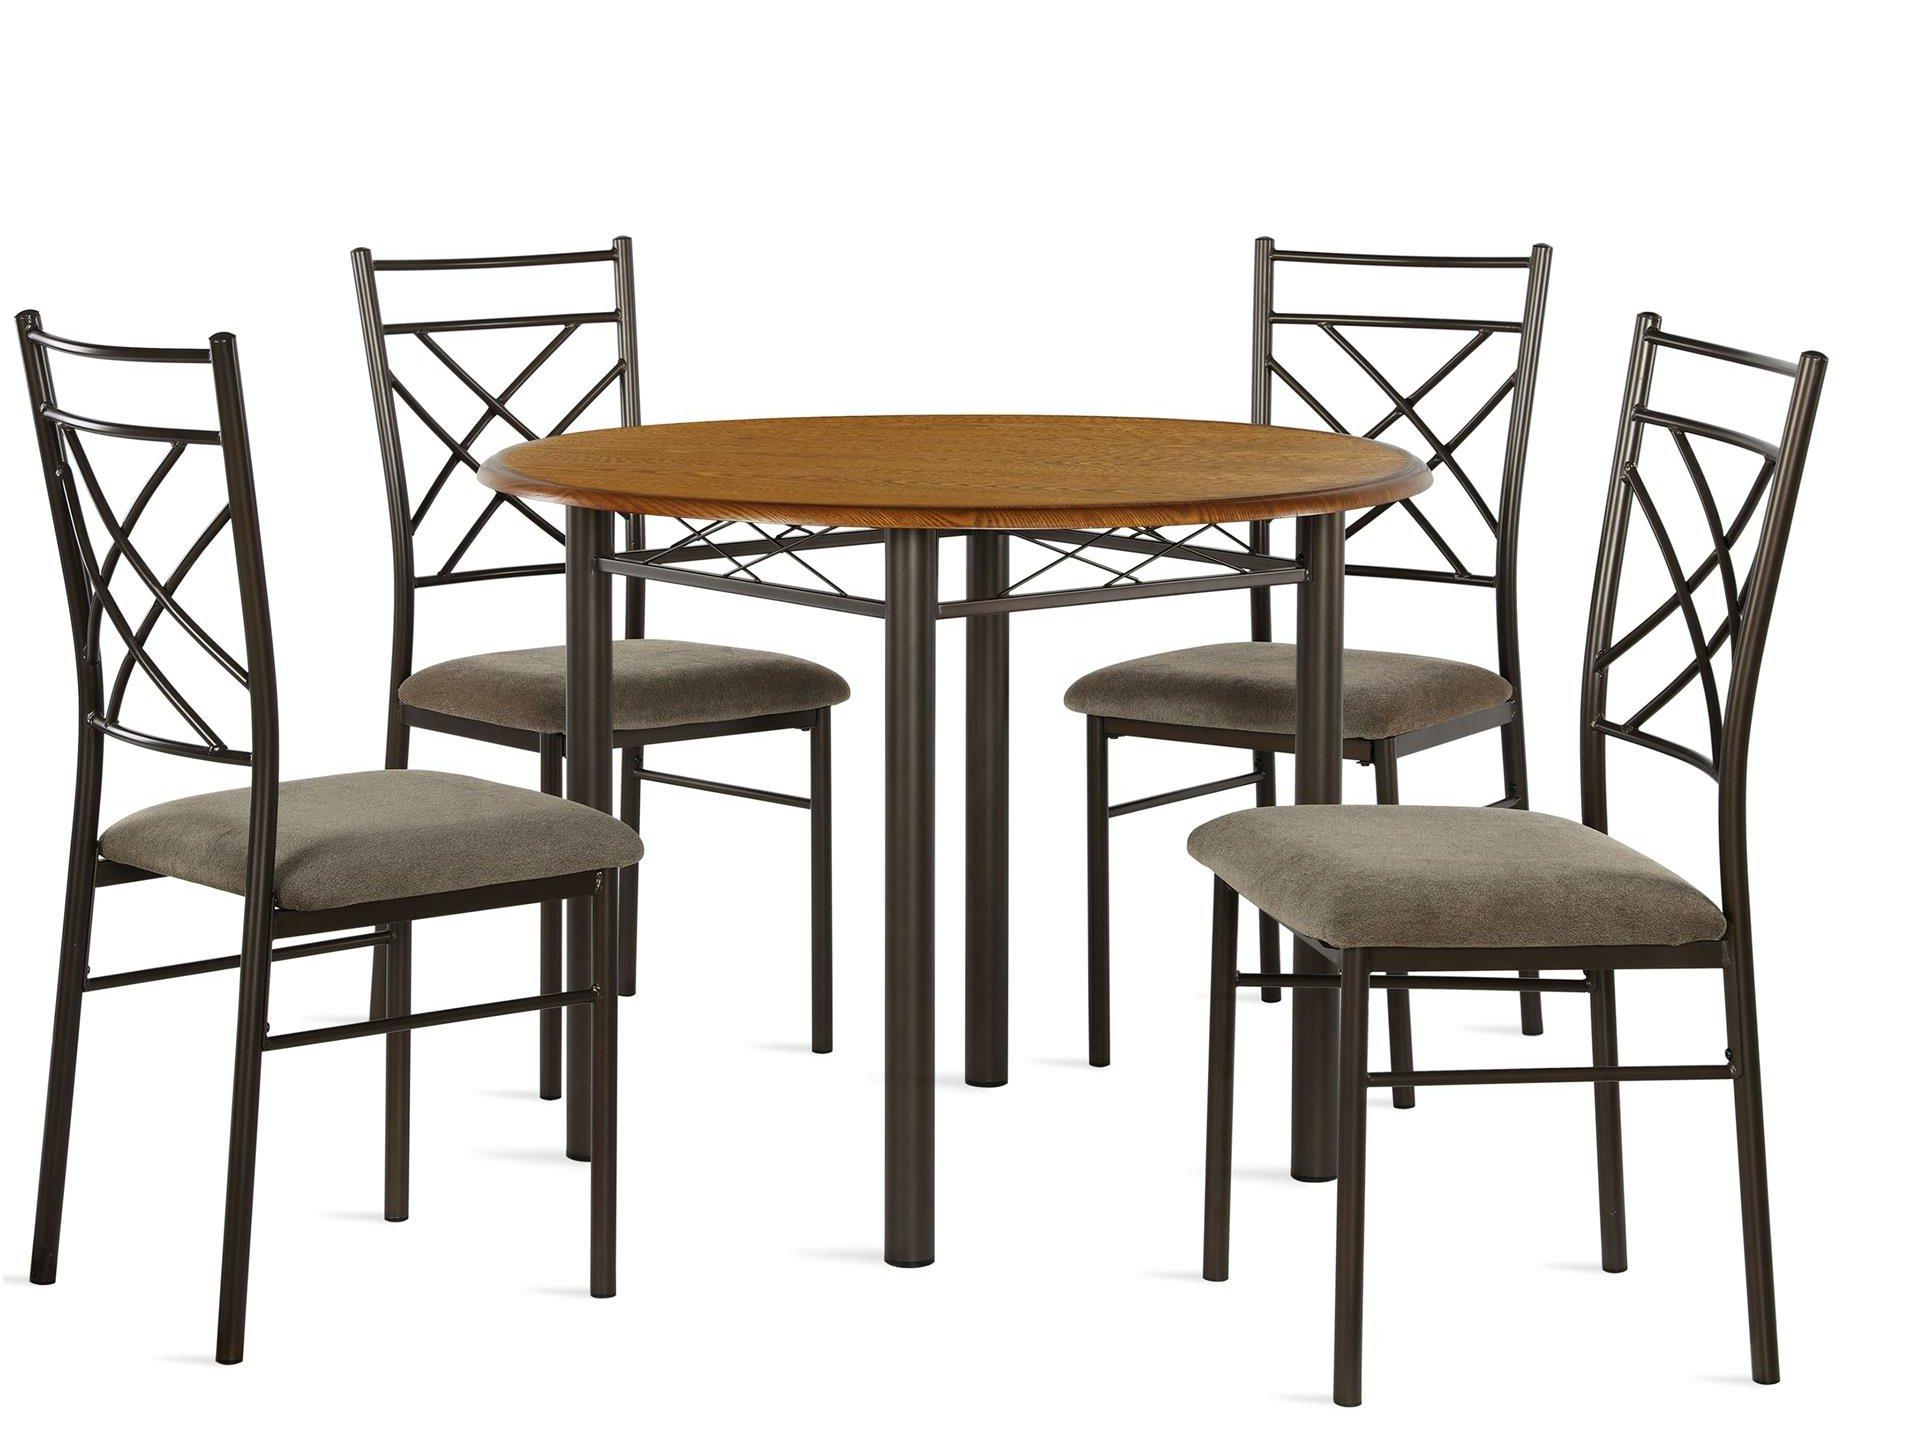 Most Current Winston Porter Janiya 5 Piece Dining Set Inside Kaelin 5 Piece Dining Sets (View 12 of 20)